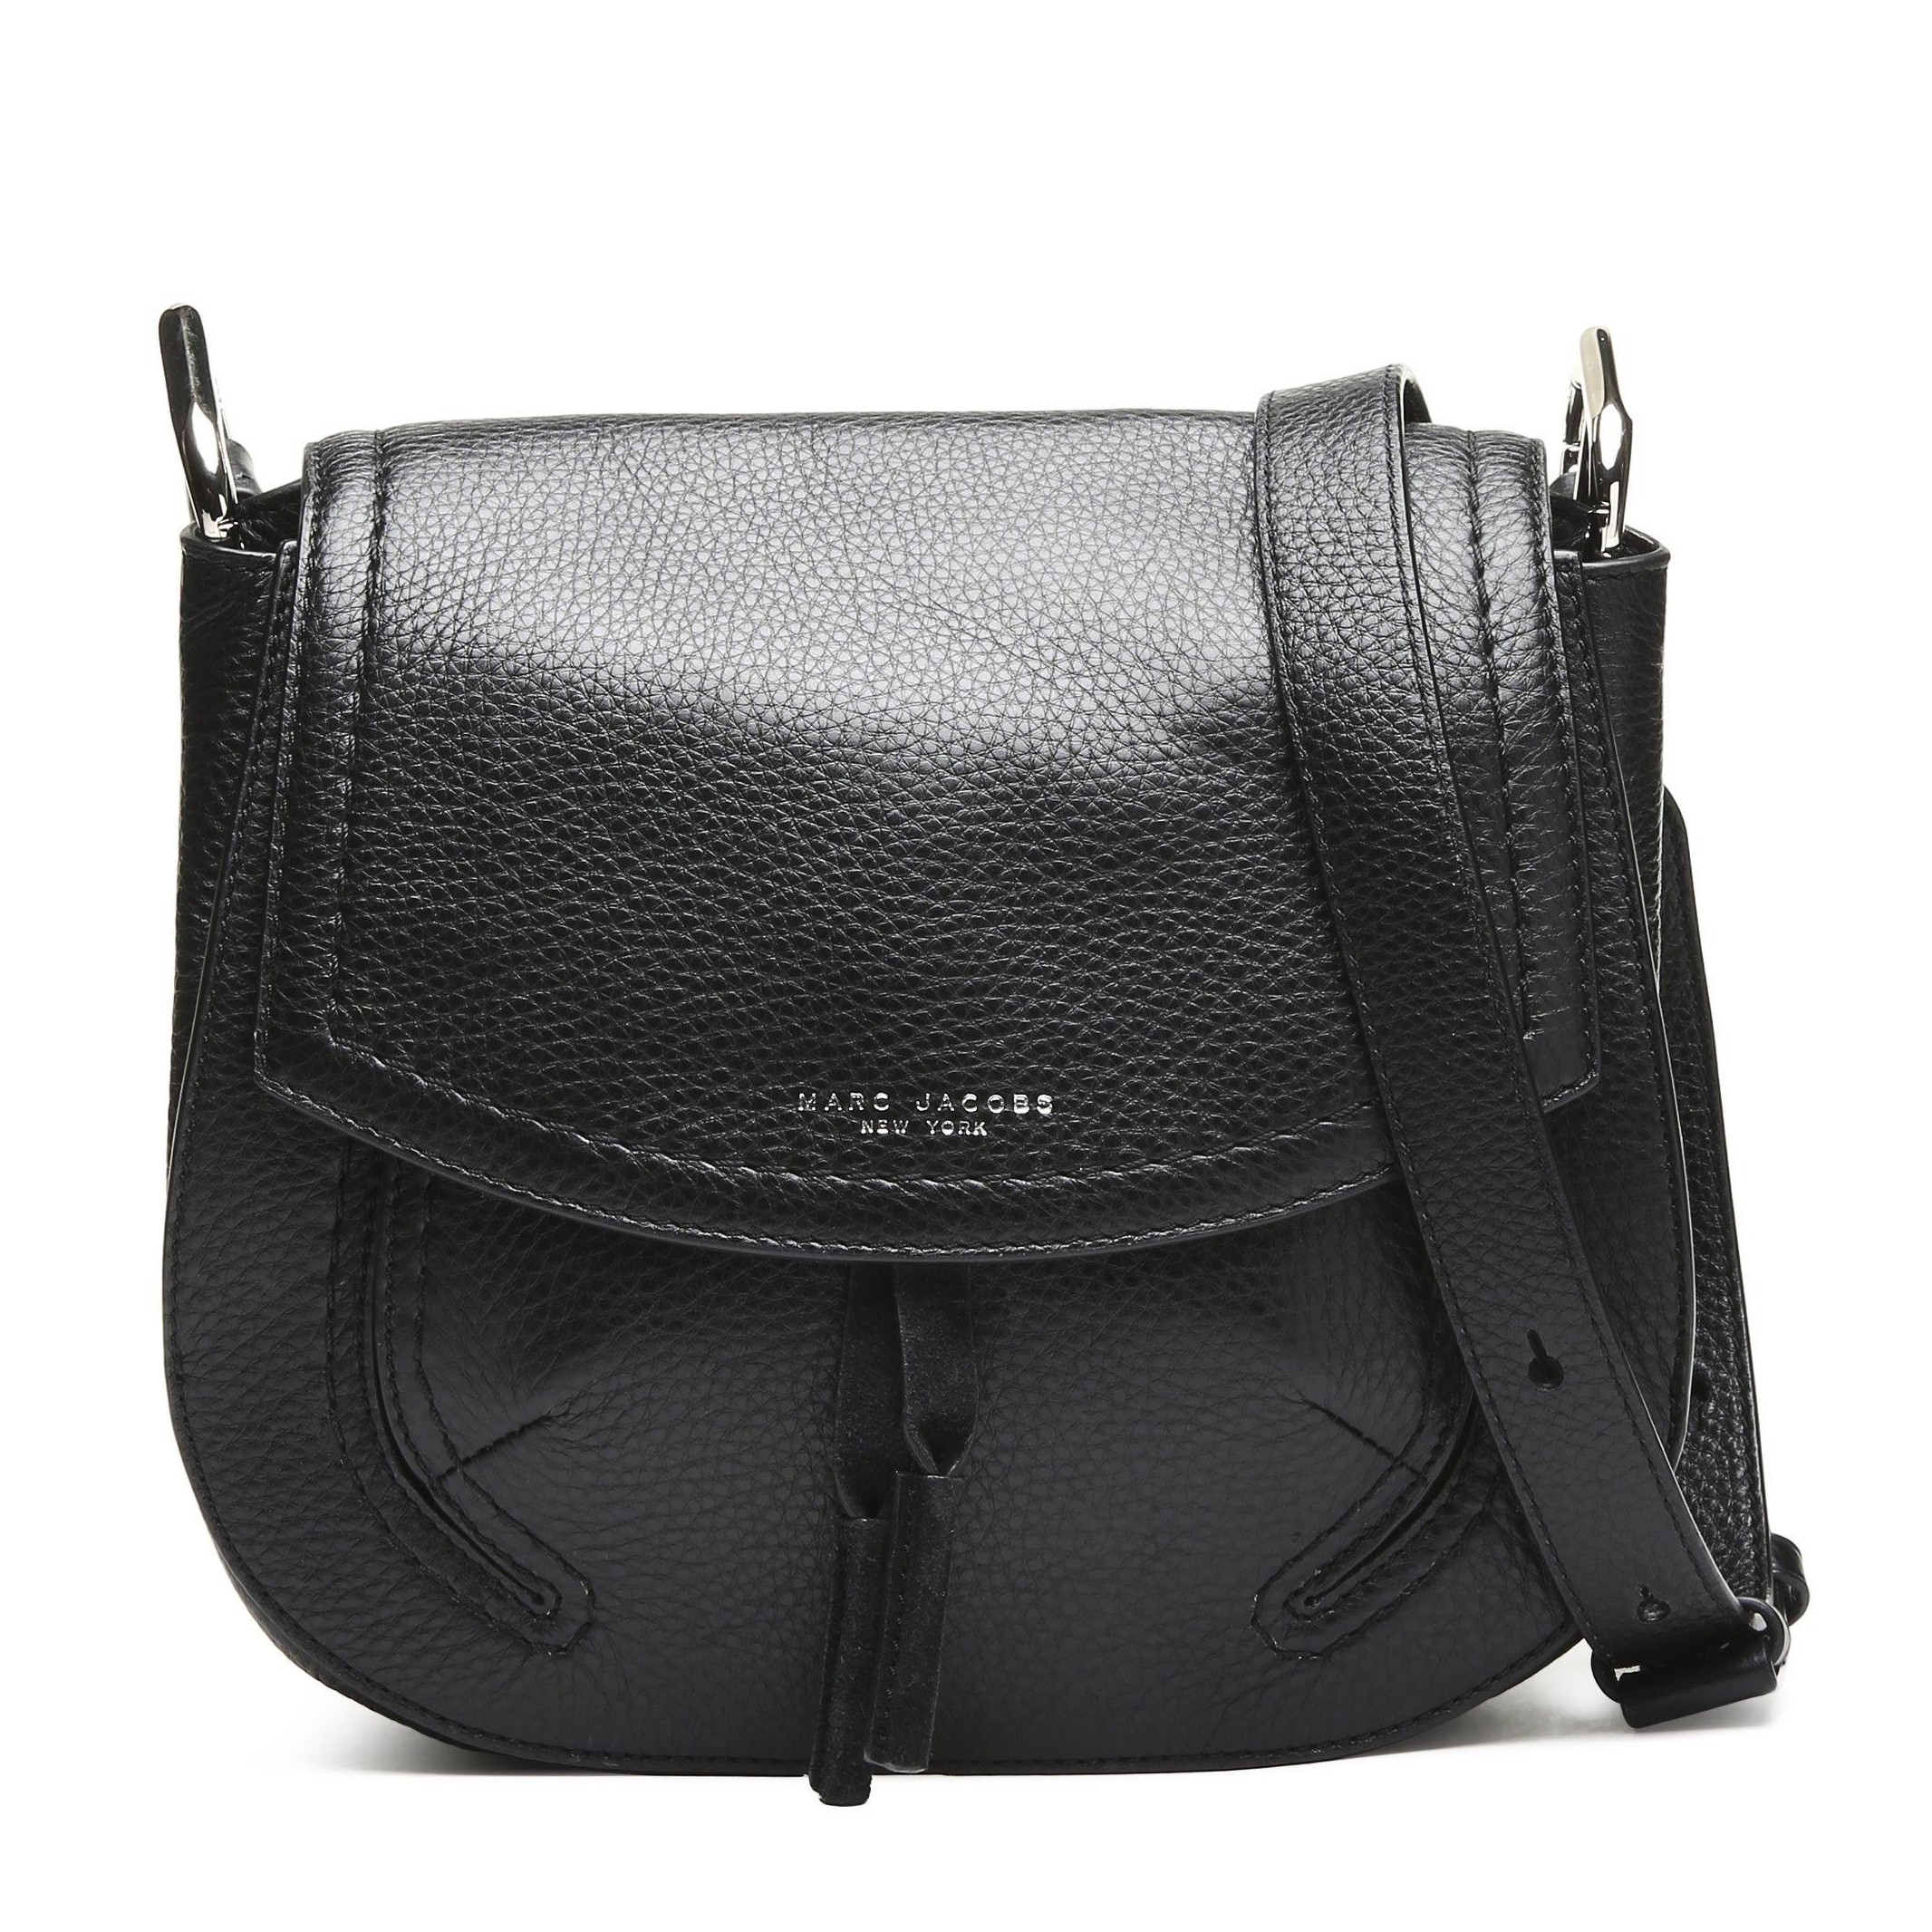 Marc Jacobs The Maverick Bag In Black